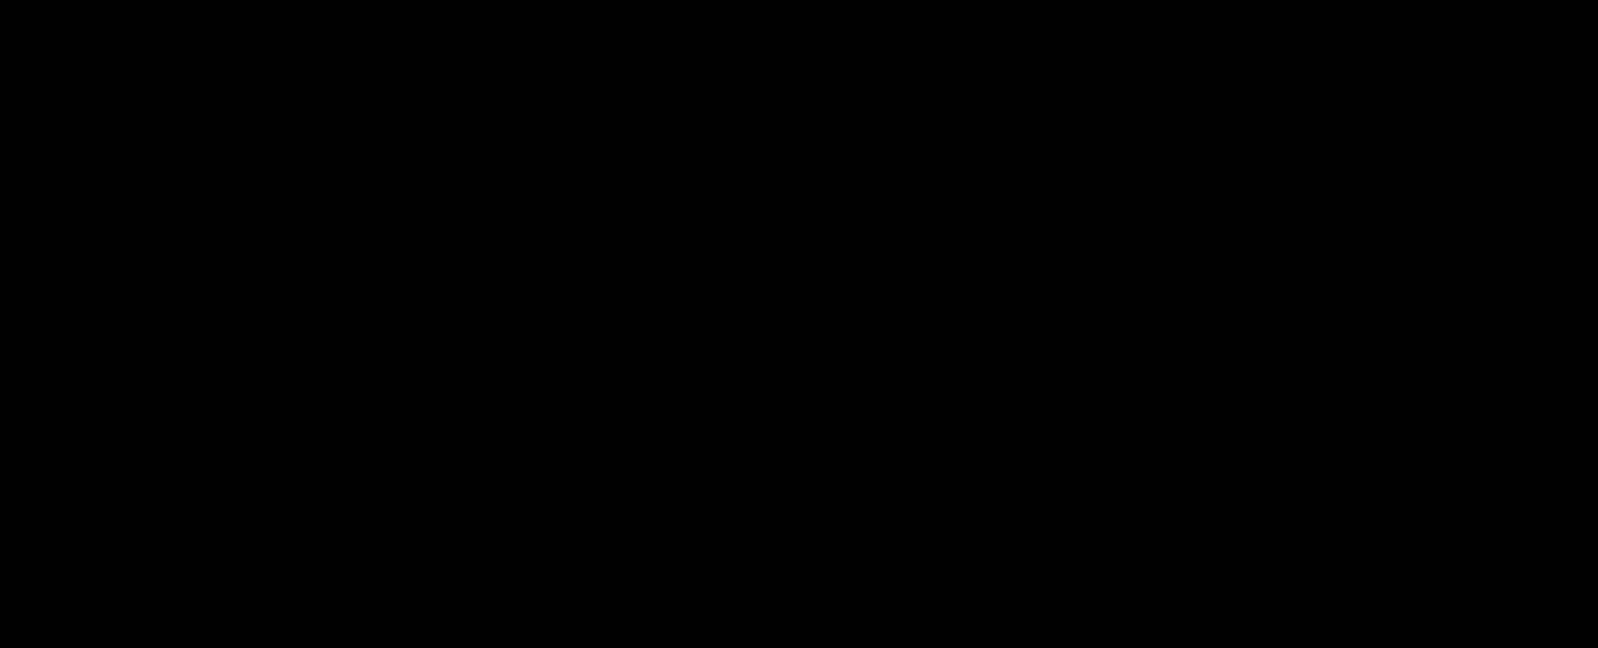 Tetrabutylammonium difluorotriphenylsilicate